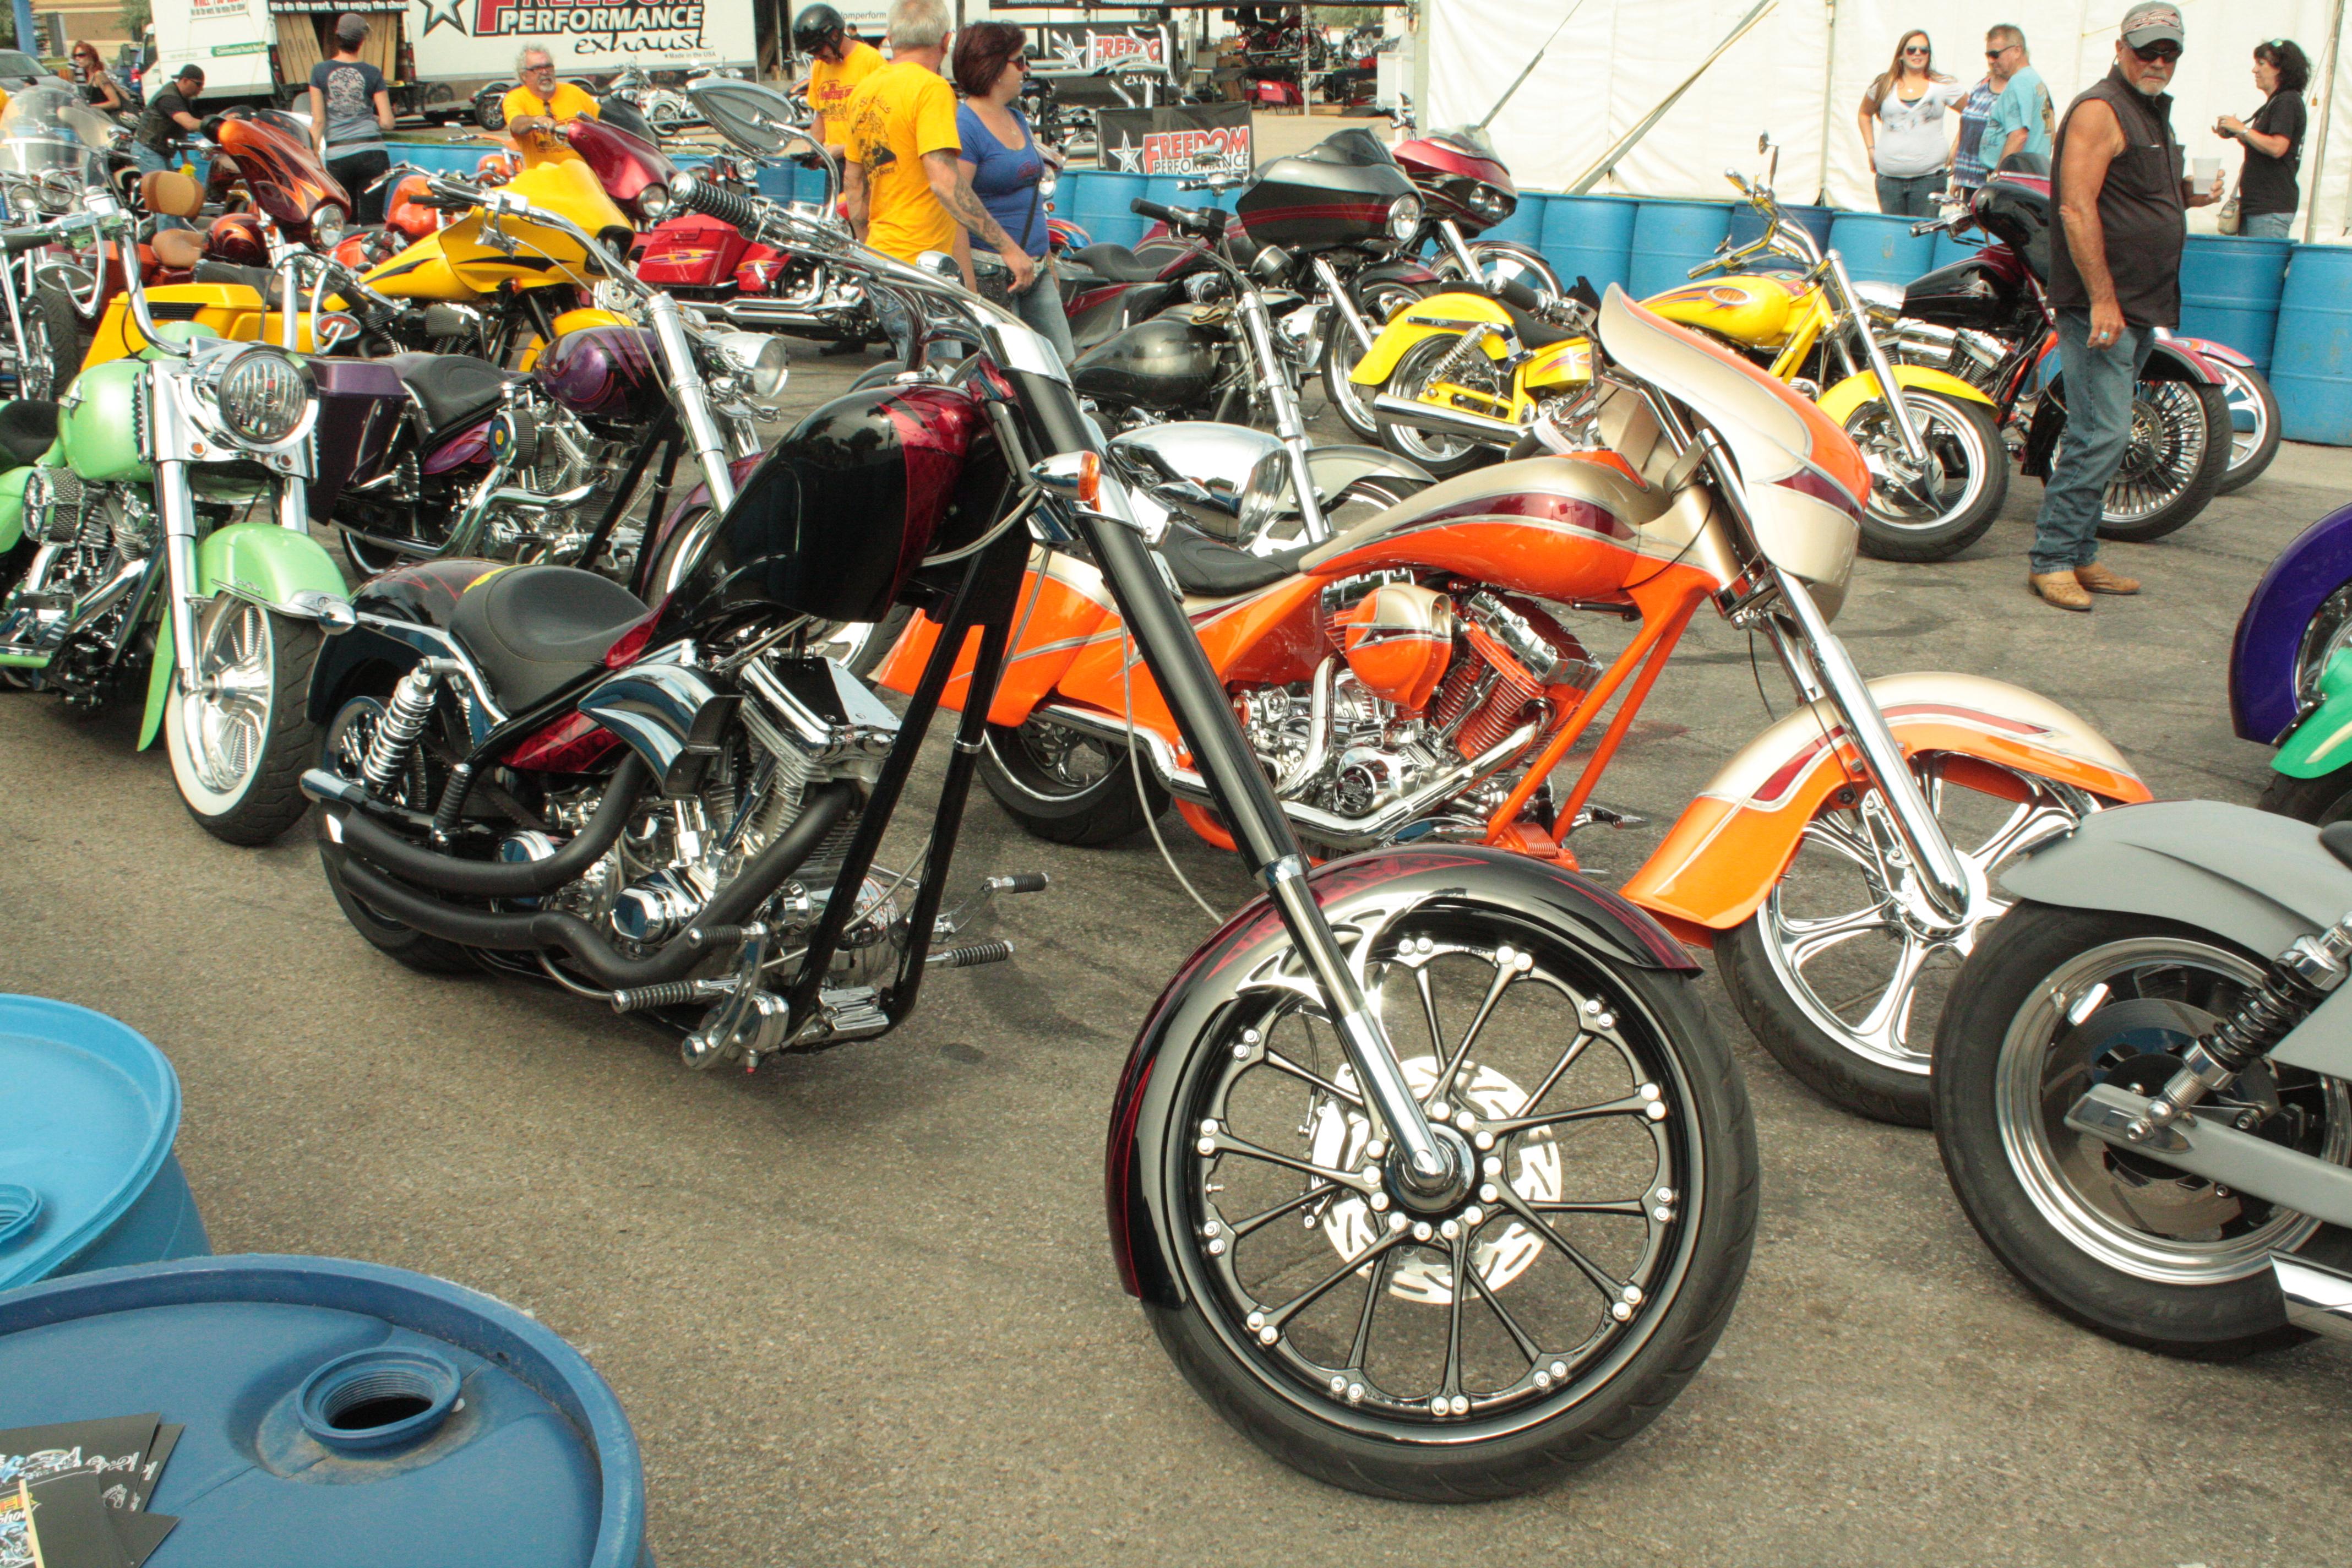 Bikes at Sturgis